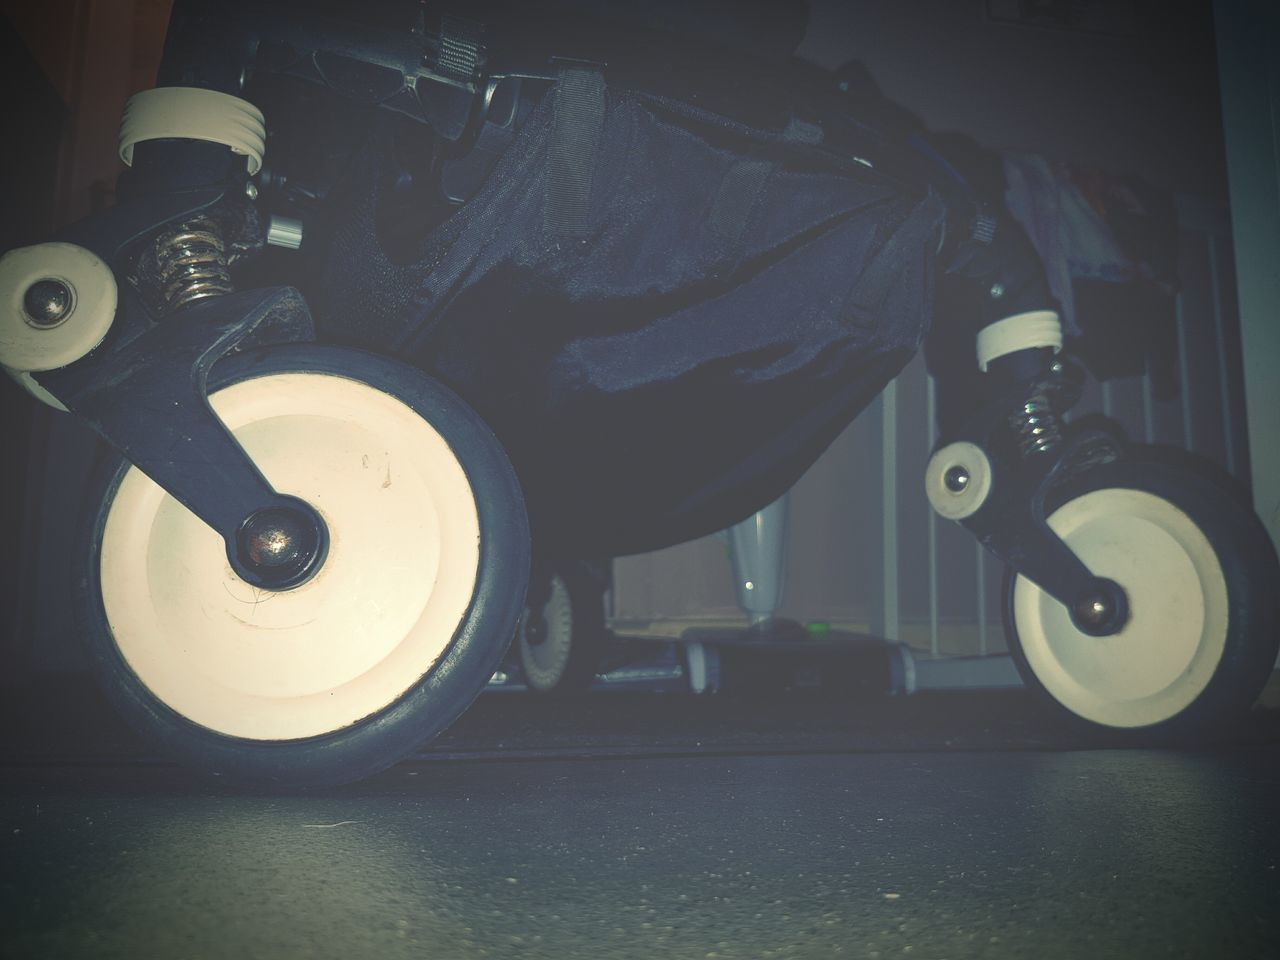 Wheels Pram Wheels Pushchair Wheels Baby Stuff Baby Transport